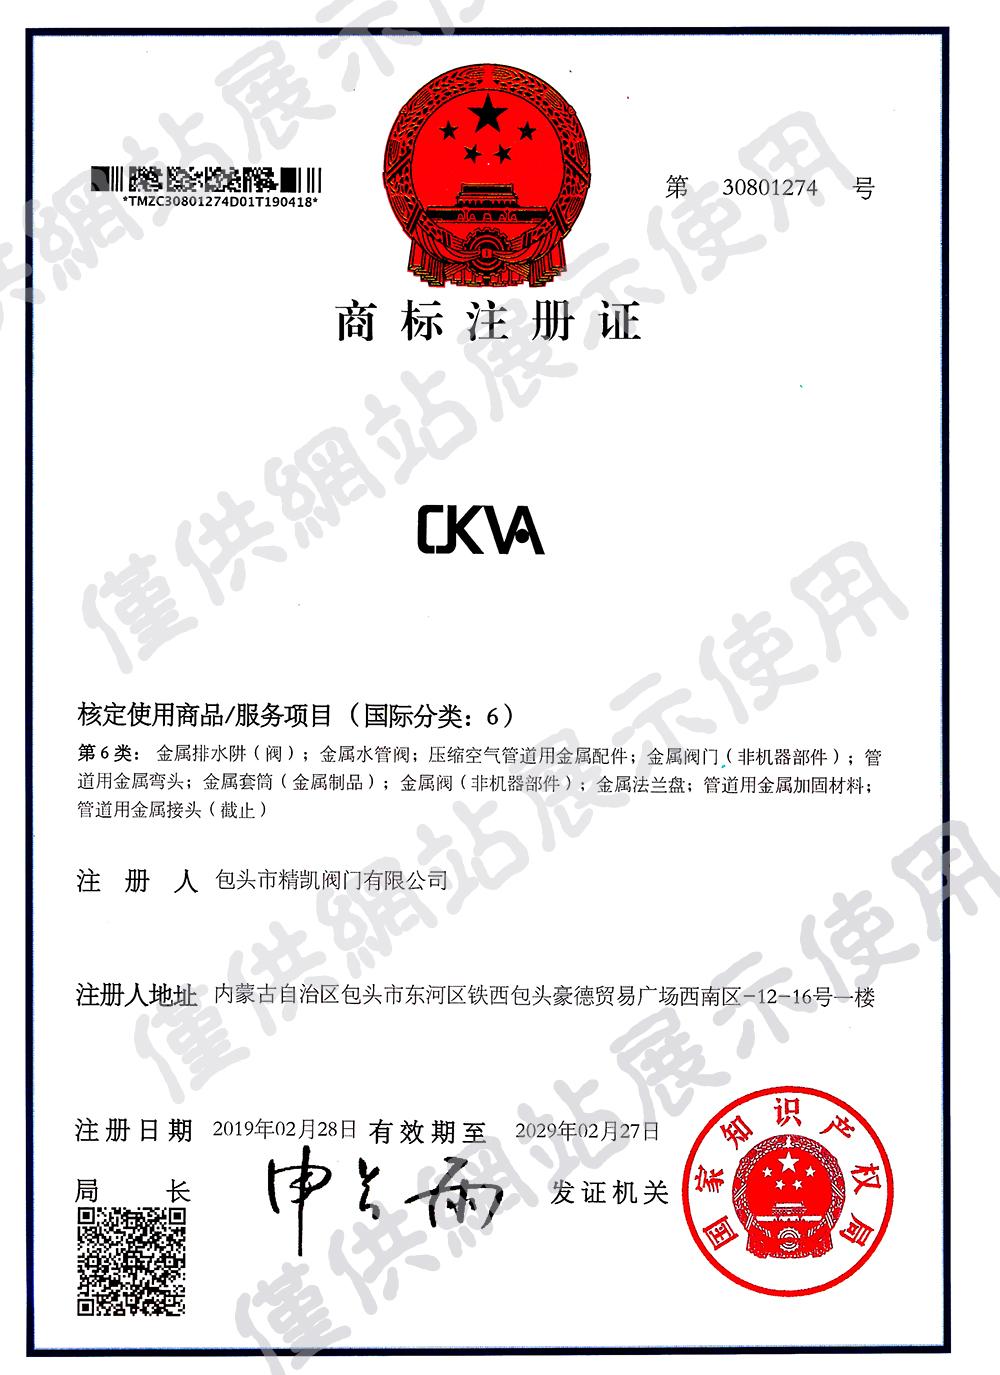 CKVA商标证正本扫描件.jpg